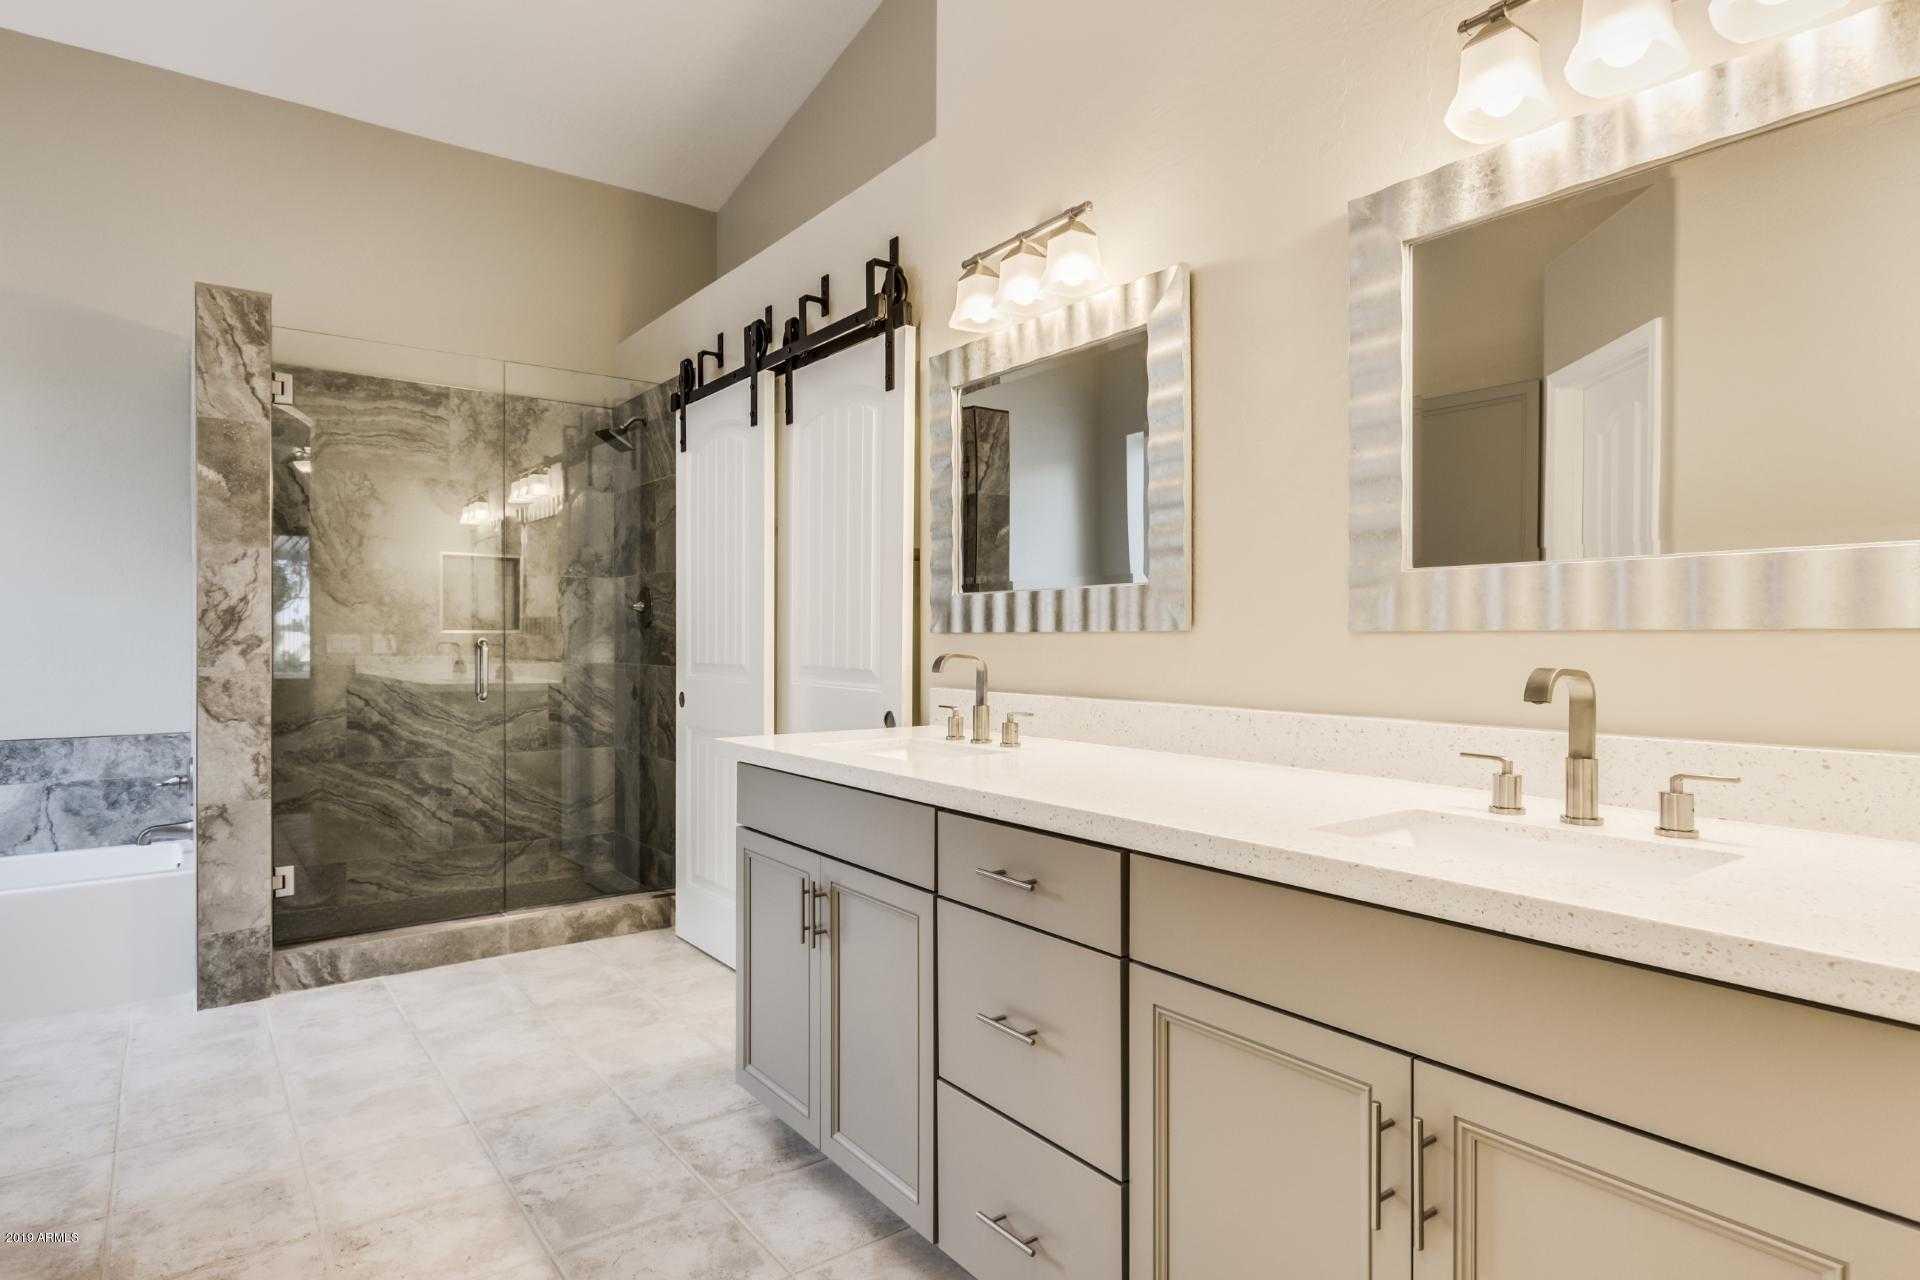 $454,000 - 4Br/2Ba - Home for Sale in Arrowhead Ranch Parcel 2, Glendale